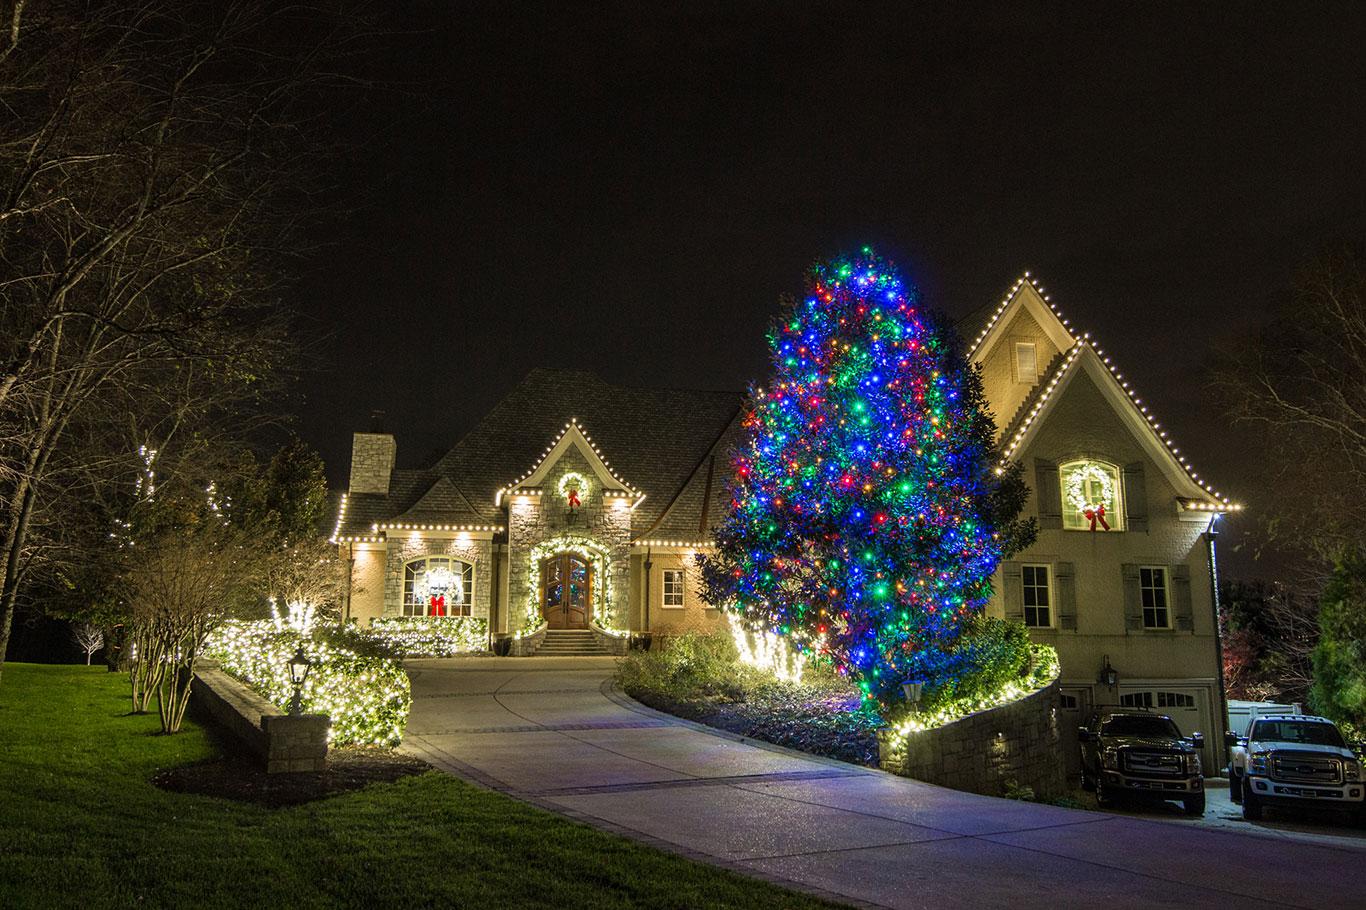 2017 Holiday Display Multi-Color Tree